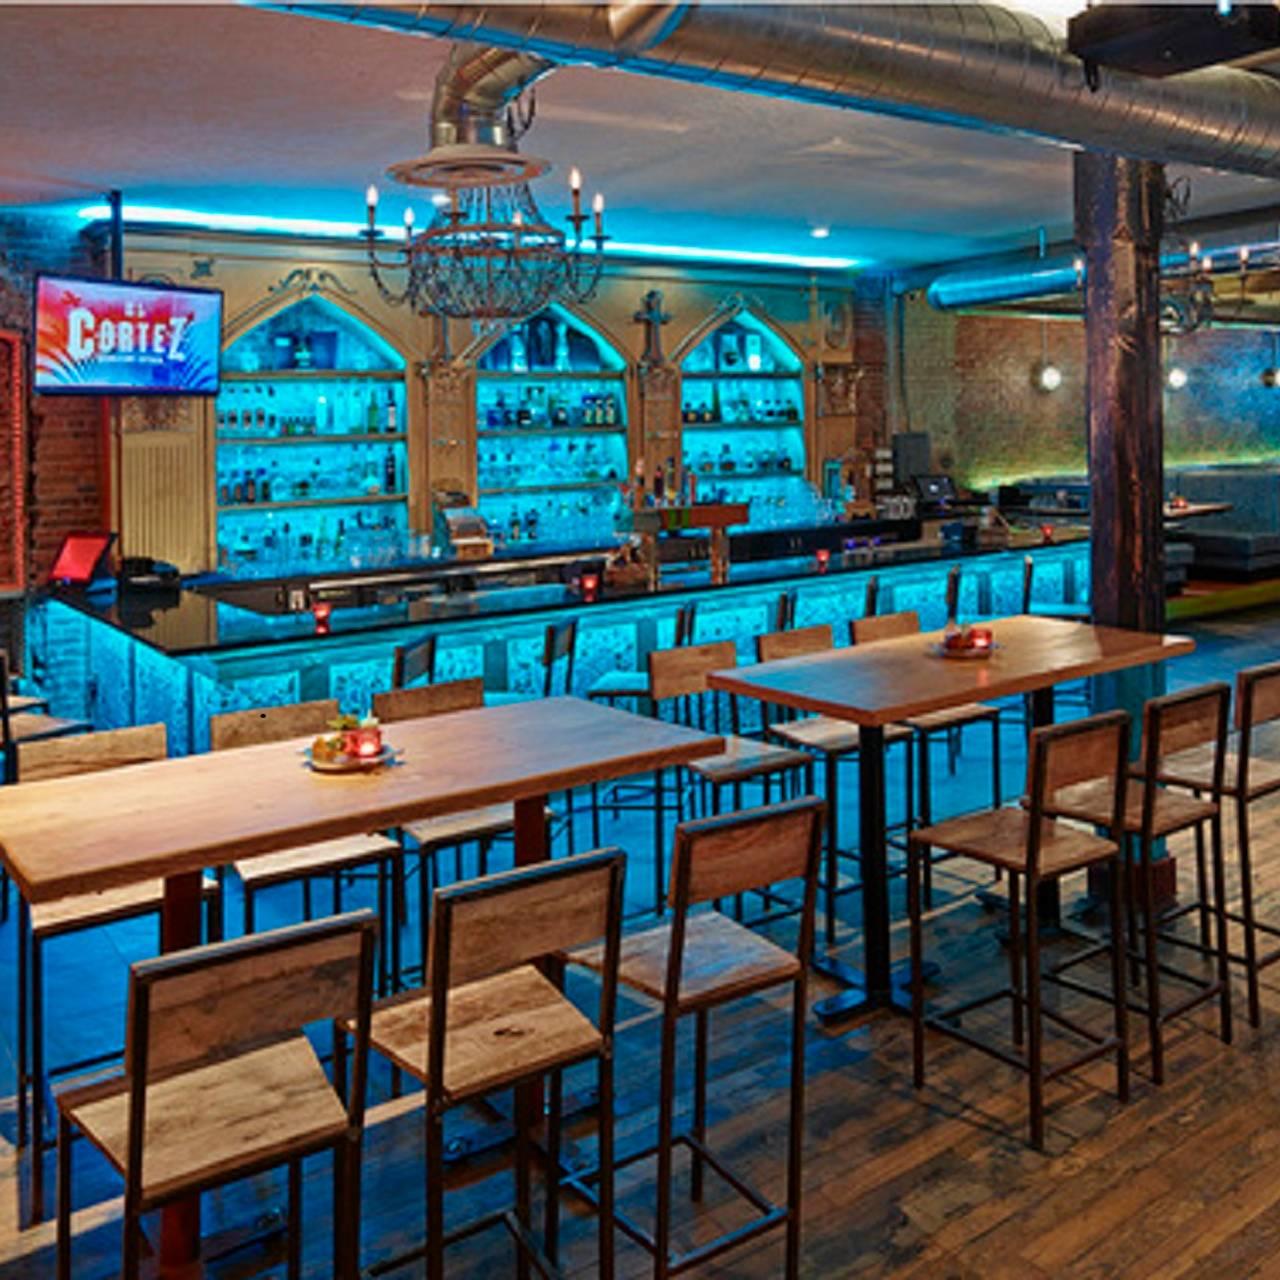 El Cortez Mexican Kitchen + Tequila Bar - Edmonton, AB   OpenTable